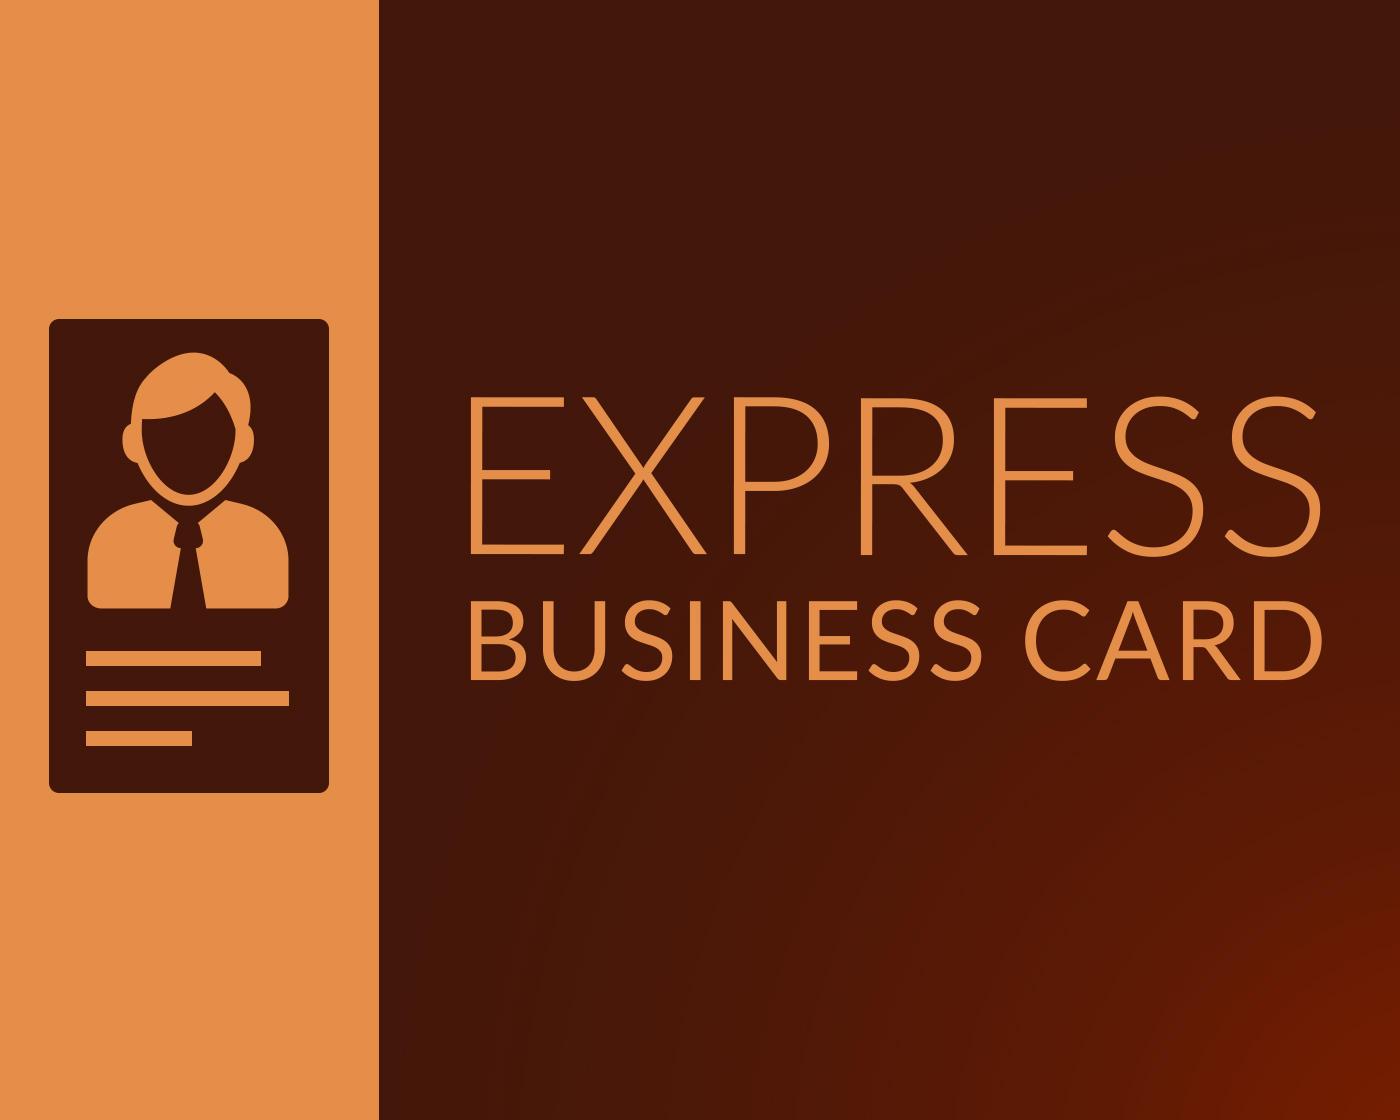 Express Business Card Design by AnasRahmoun on Envato Studio